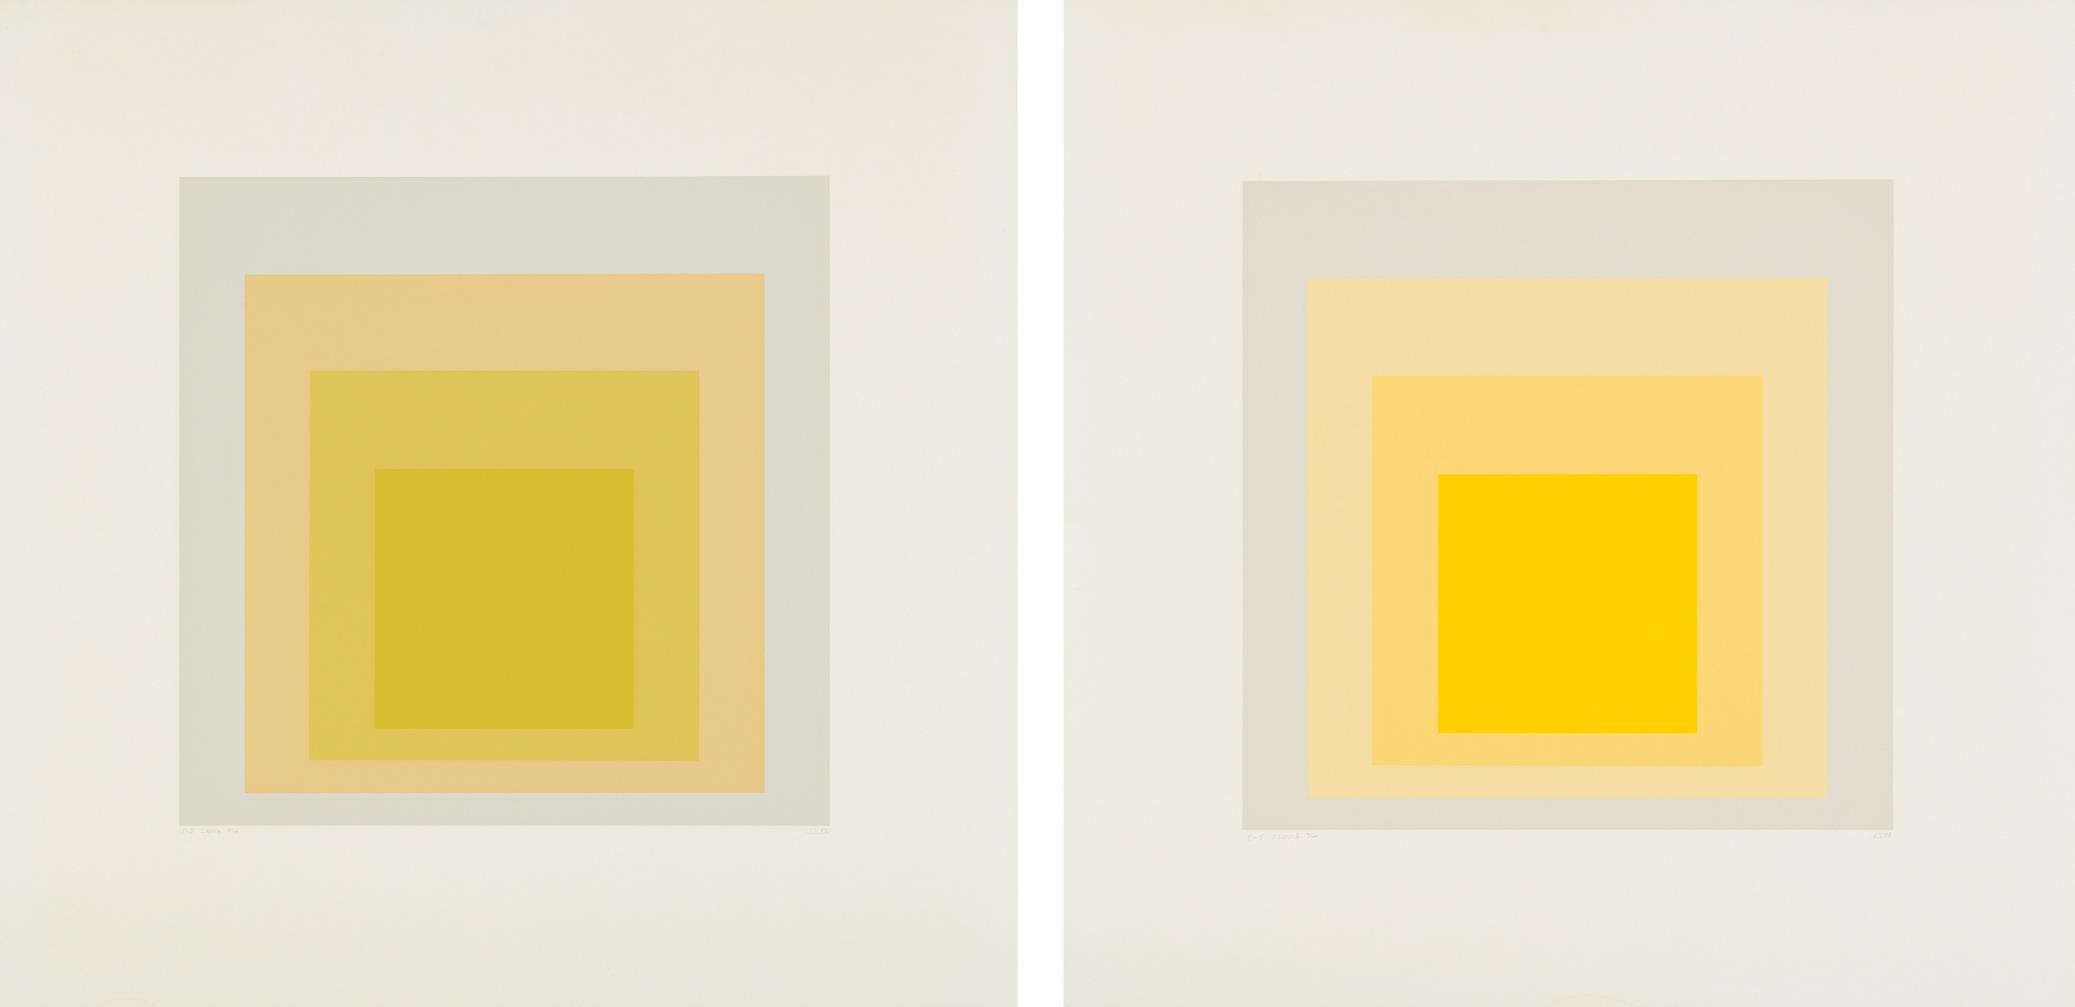 Josef Albers-I-S LXXIIIa; and I-S LXXIIIb-1973